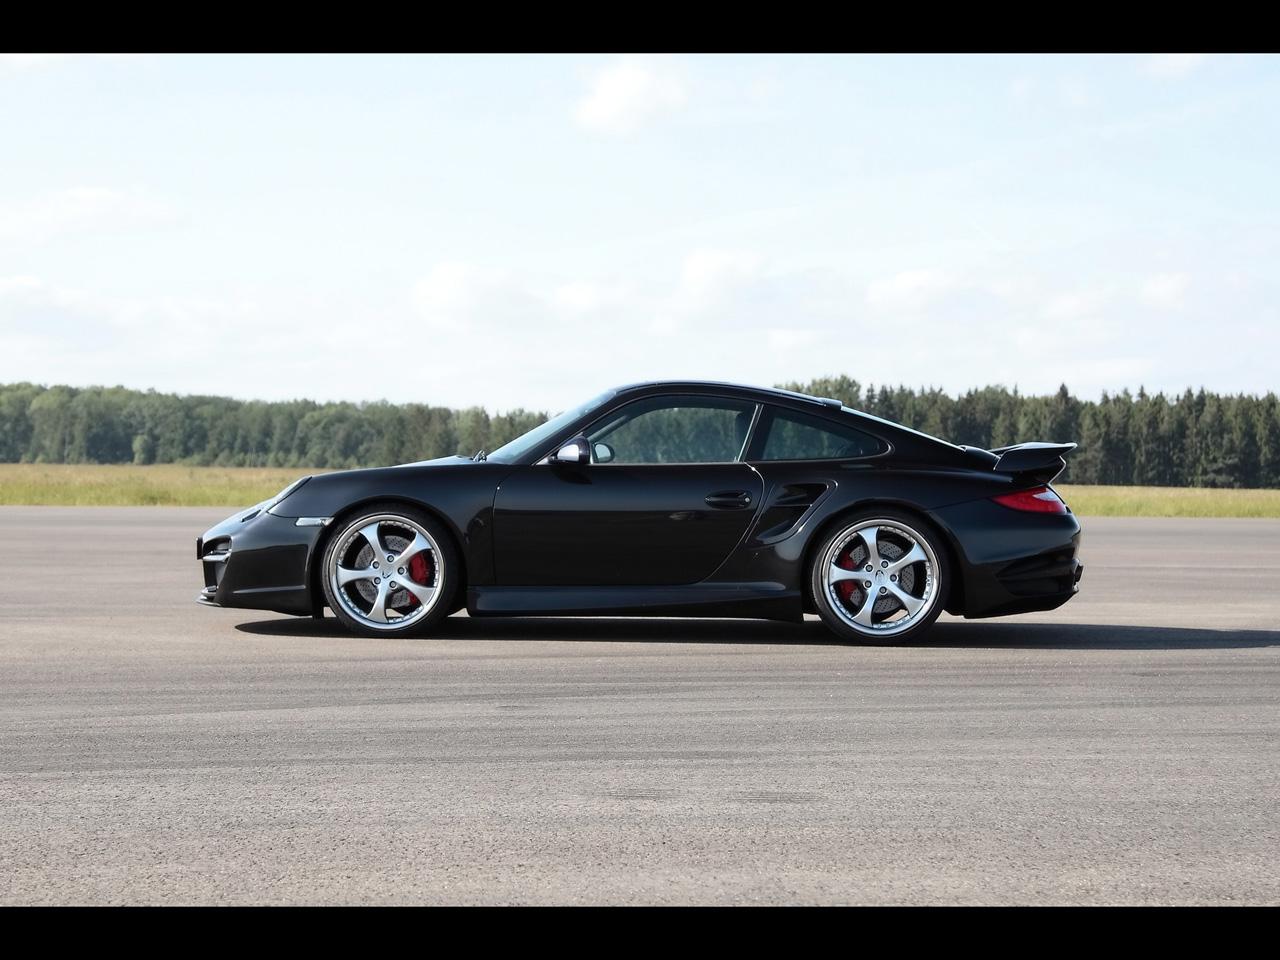 2010 techart porsche 911 turbo aerodynamic kit ii black side - 911 Porsche Black